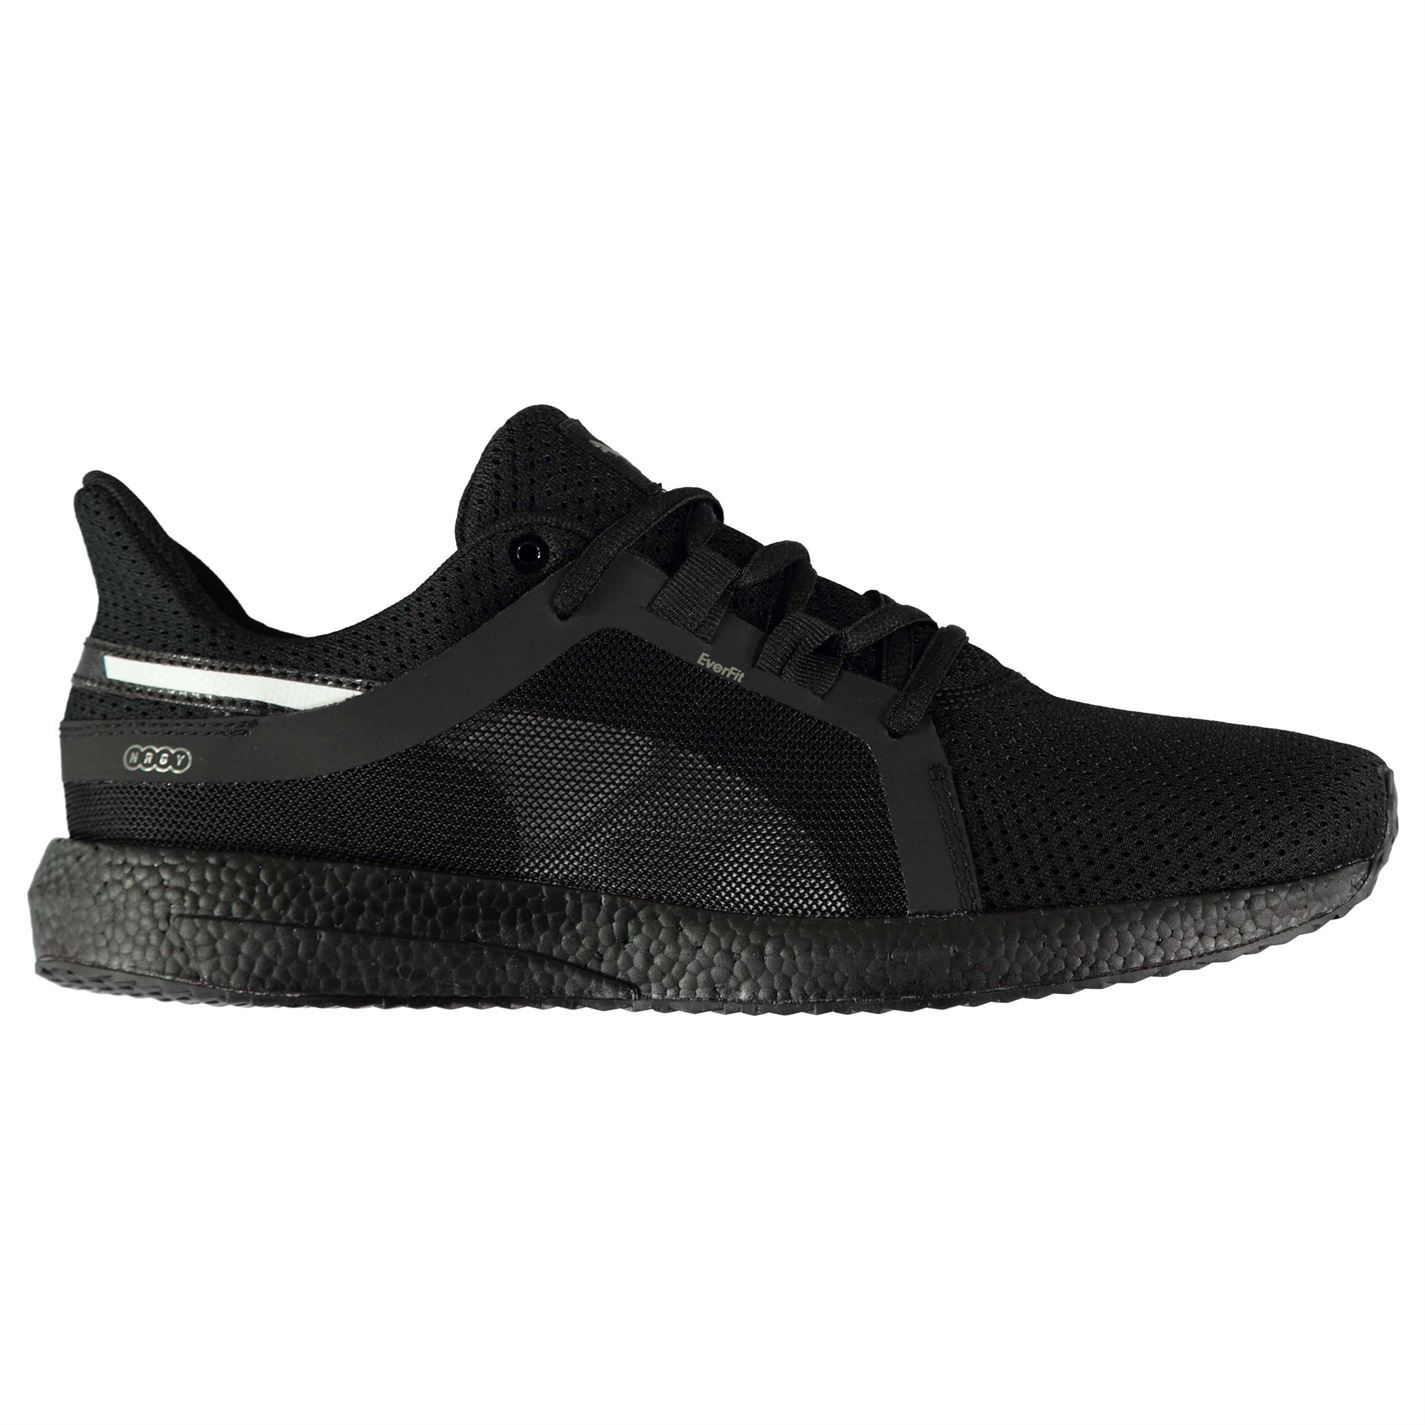 93f1e1075e70 ... Puma Mega NRGY Turbo Trainers Mens Black Sports Shoes Sneakers ...